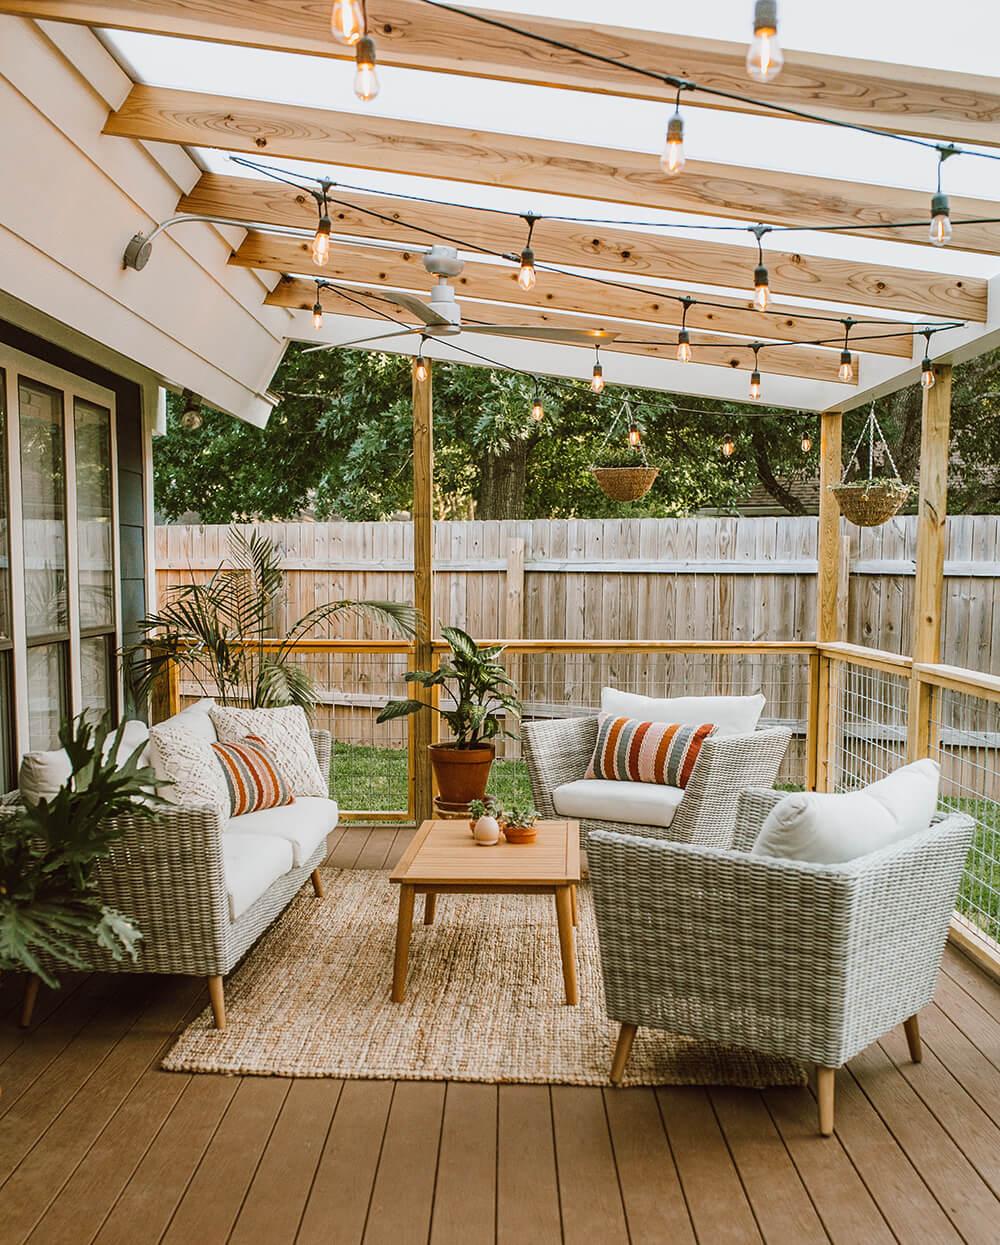 Welcoming Backyard Sitting Ideas for Entertaining